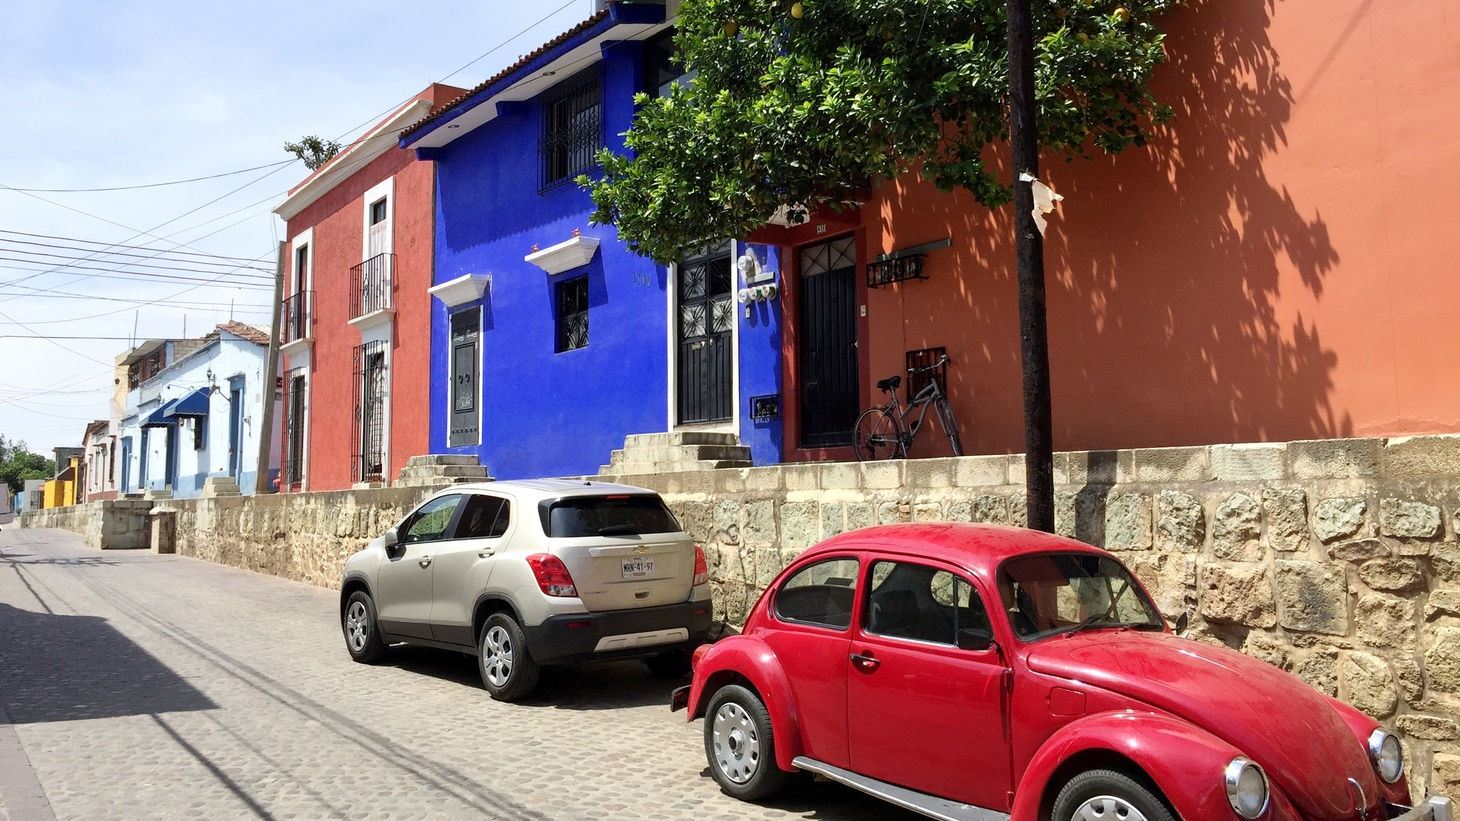 Edward Goldman praises the varied and sophisticated art scene in Oaxaca, Mexico.